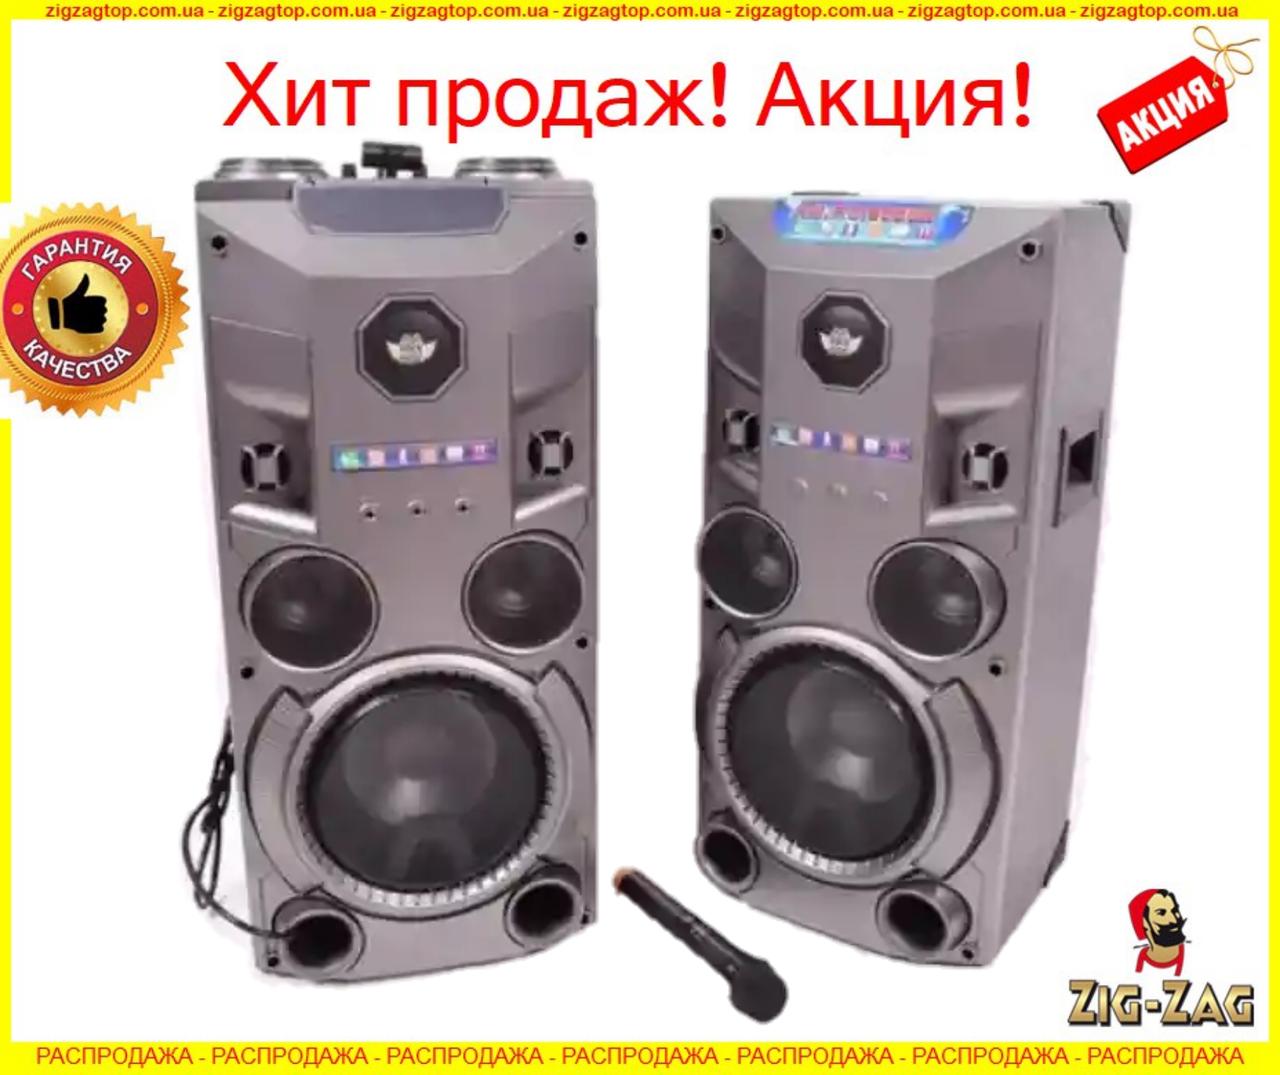 МОЩНЫЕ Колонки Сабвуфер Rock Music RC-8950 Аудио колонки для ПК Акустика (150W/FM/Bluetooth/USB)